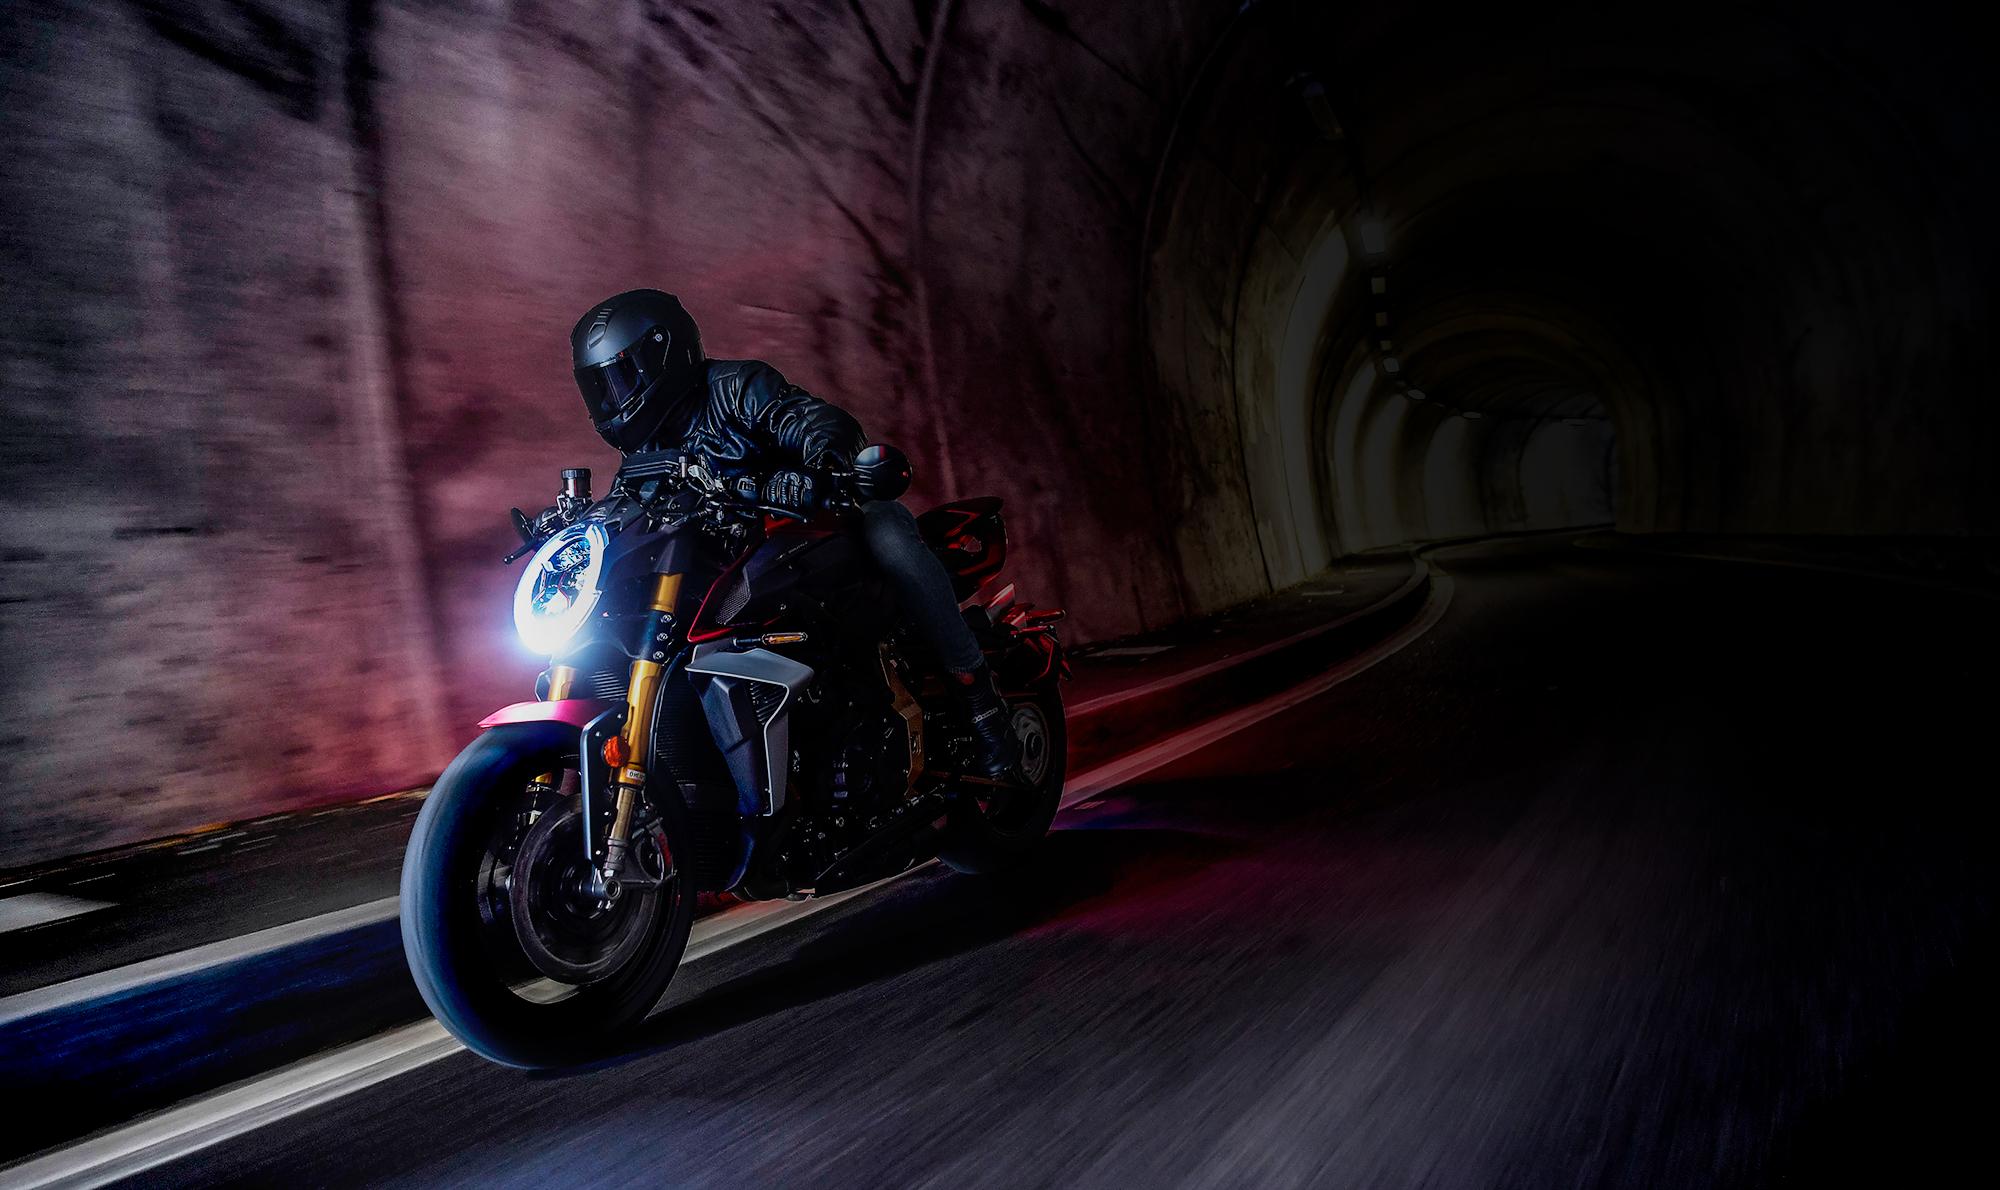 mv agusta brutale 1000 motorcycle riding through a dark tunnel